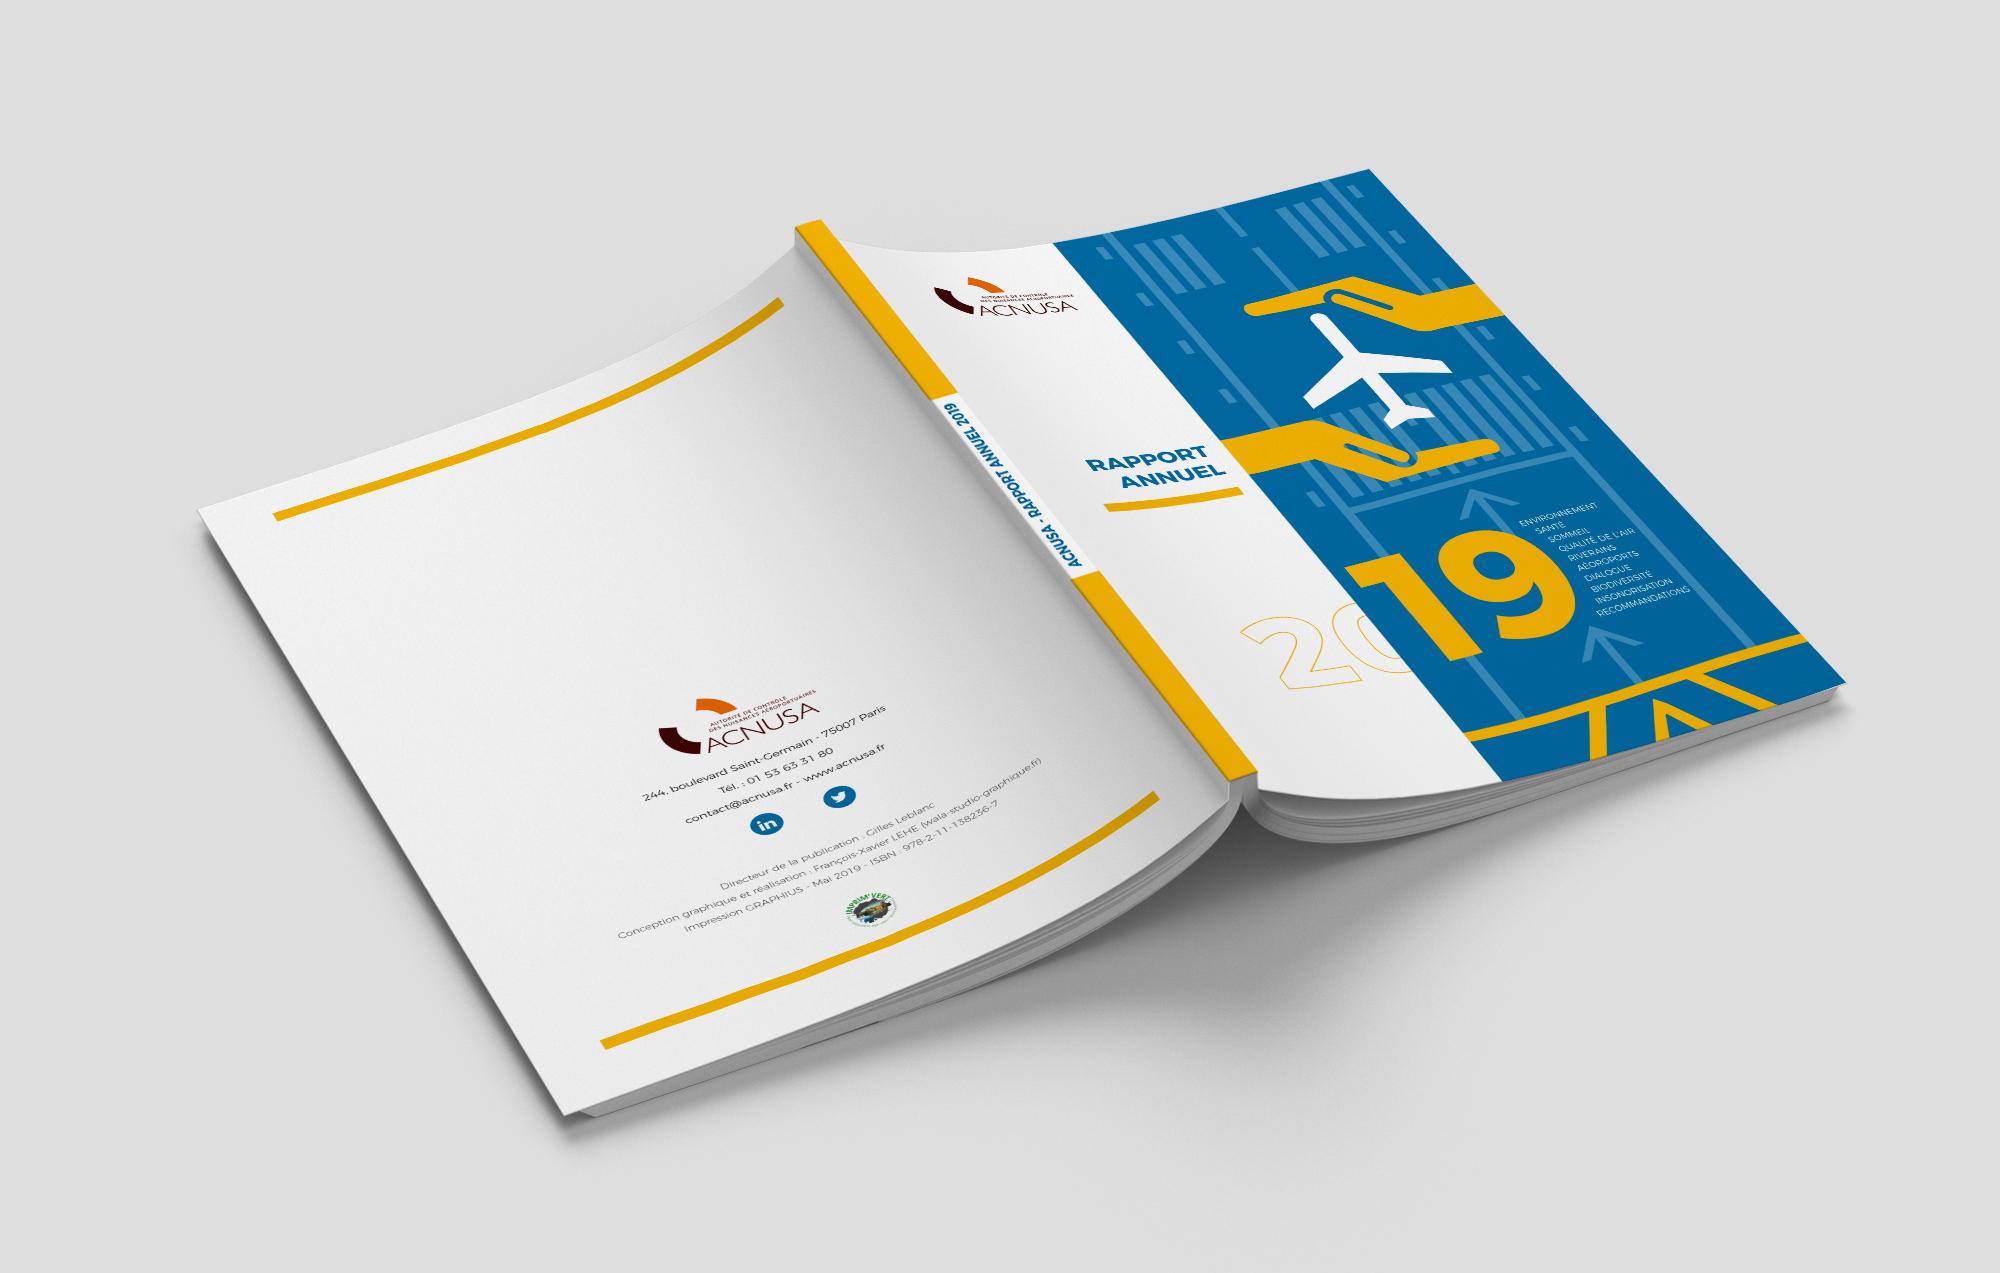 ACNUSA-Rapport-annuel-2019-conception-wala-studio-graphique5